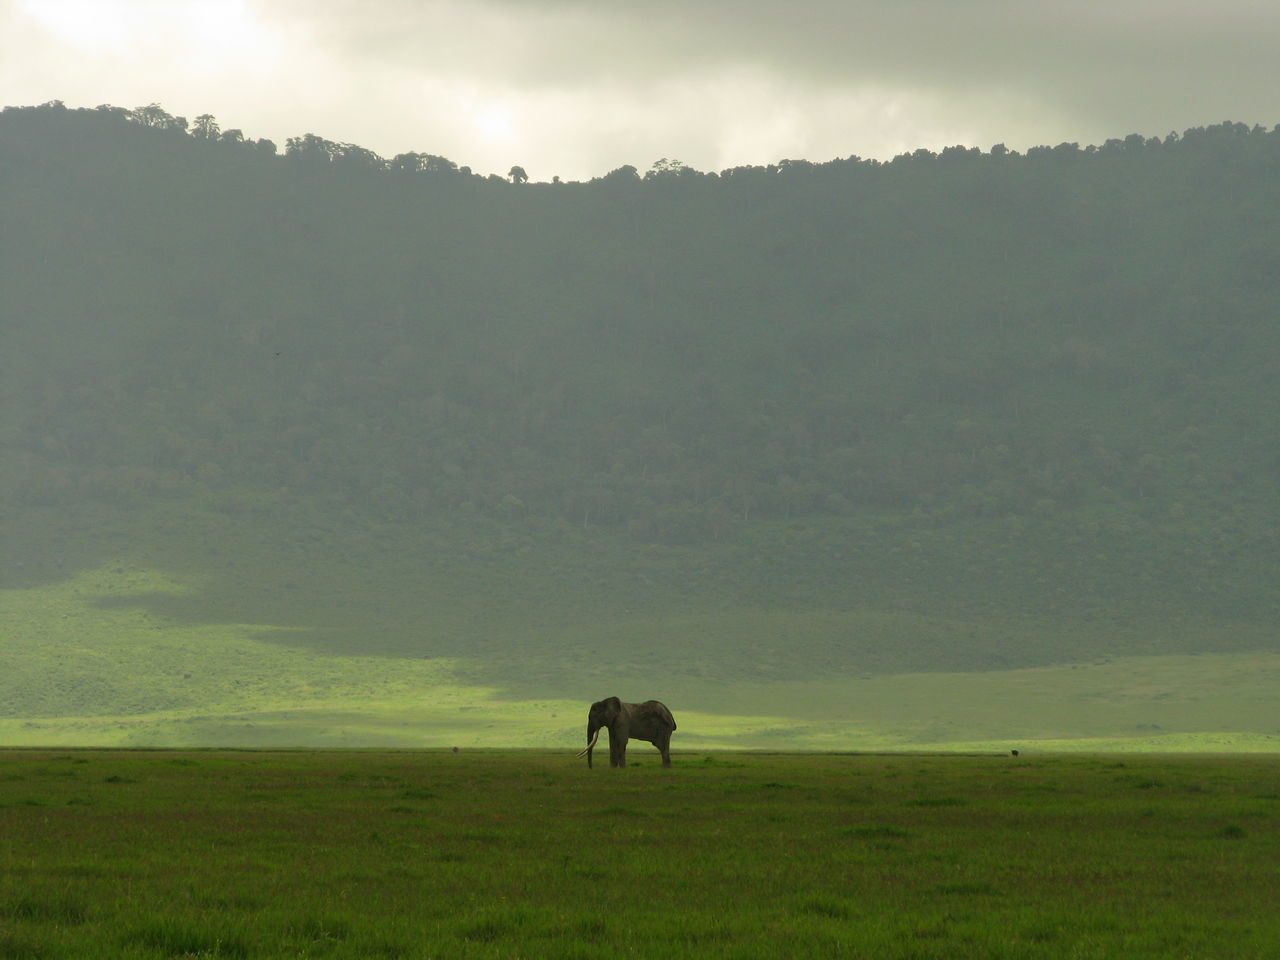 Beautiful stock photos of elefant, landscape, one animal, tranquil scene, grass